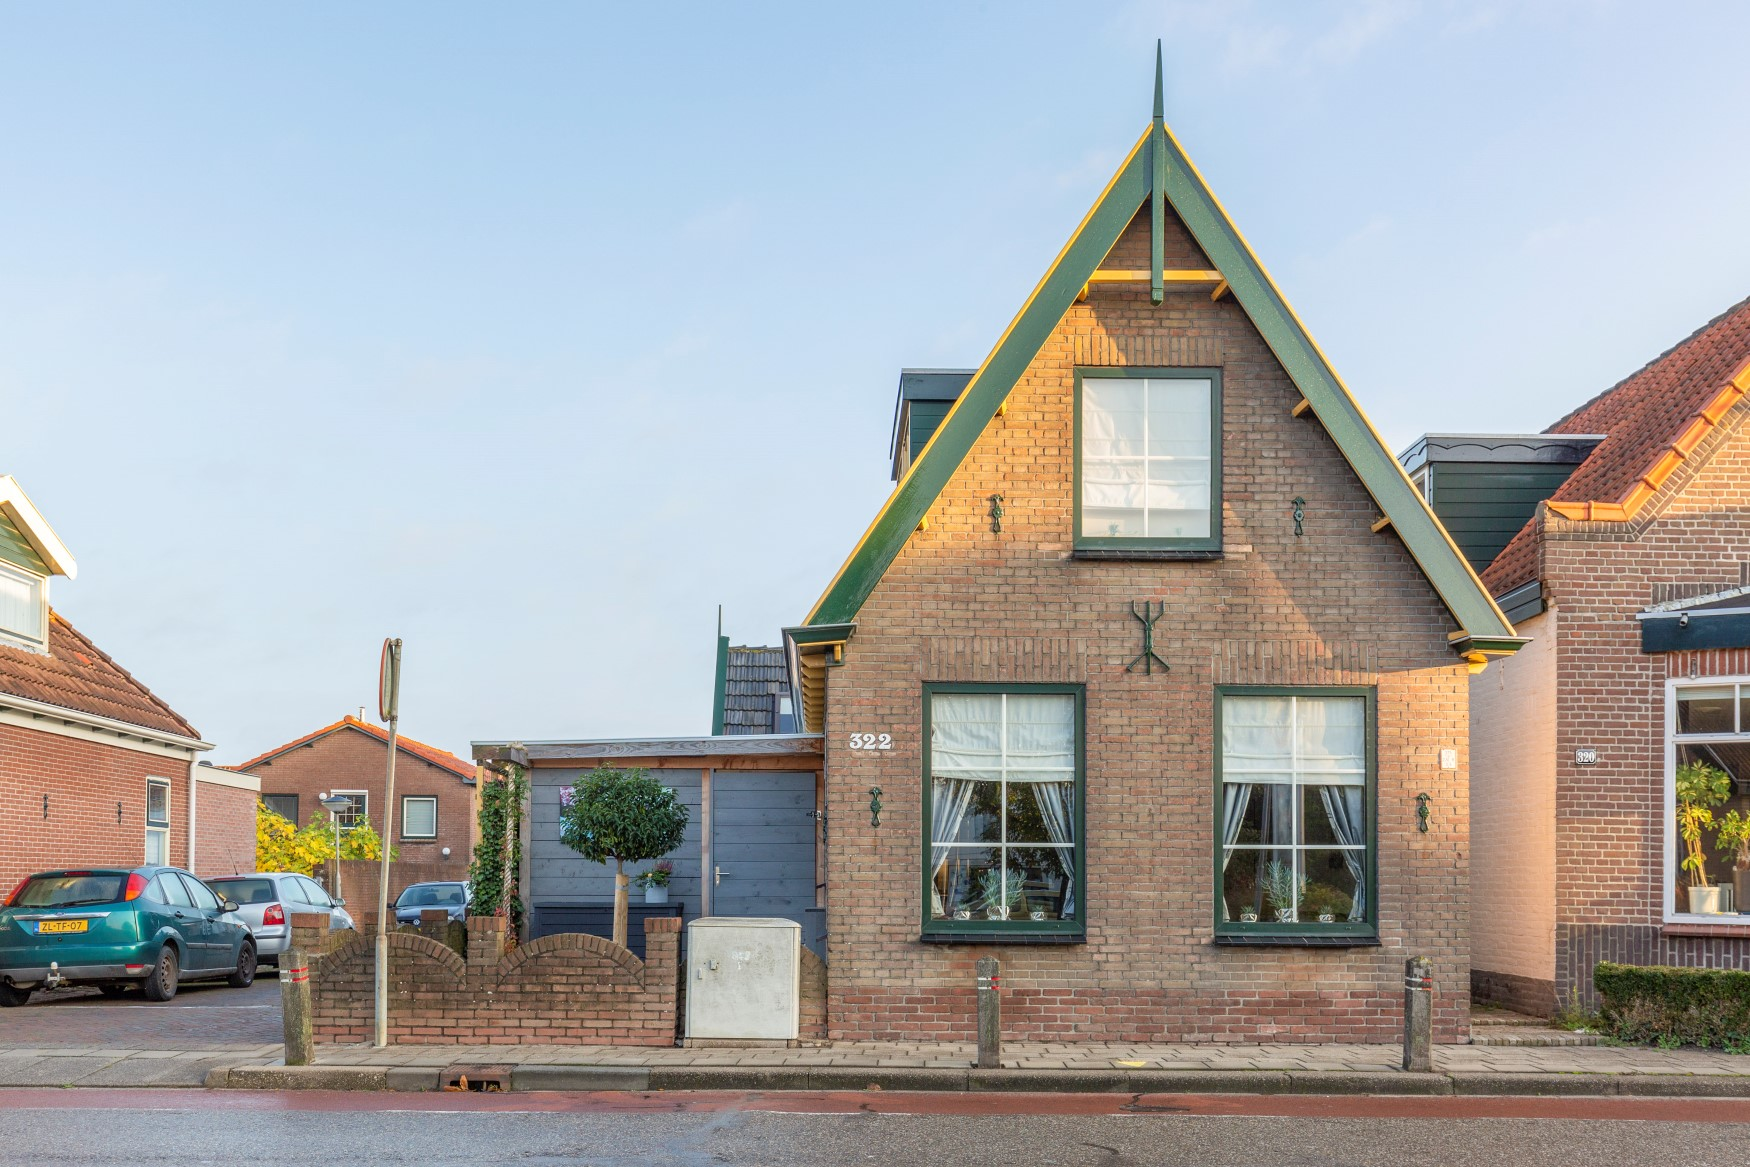 Verkocht Zesstedenweg 322 Grootebroek Westfries Goed Makelaars Adviseurs